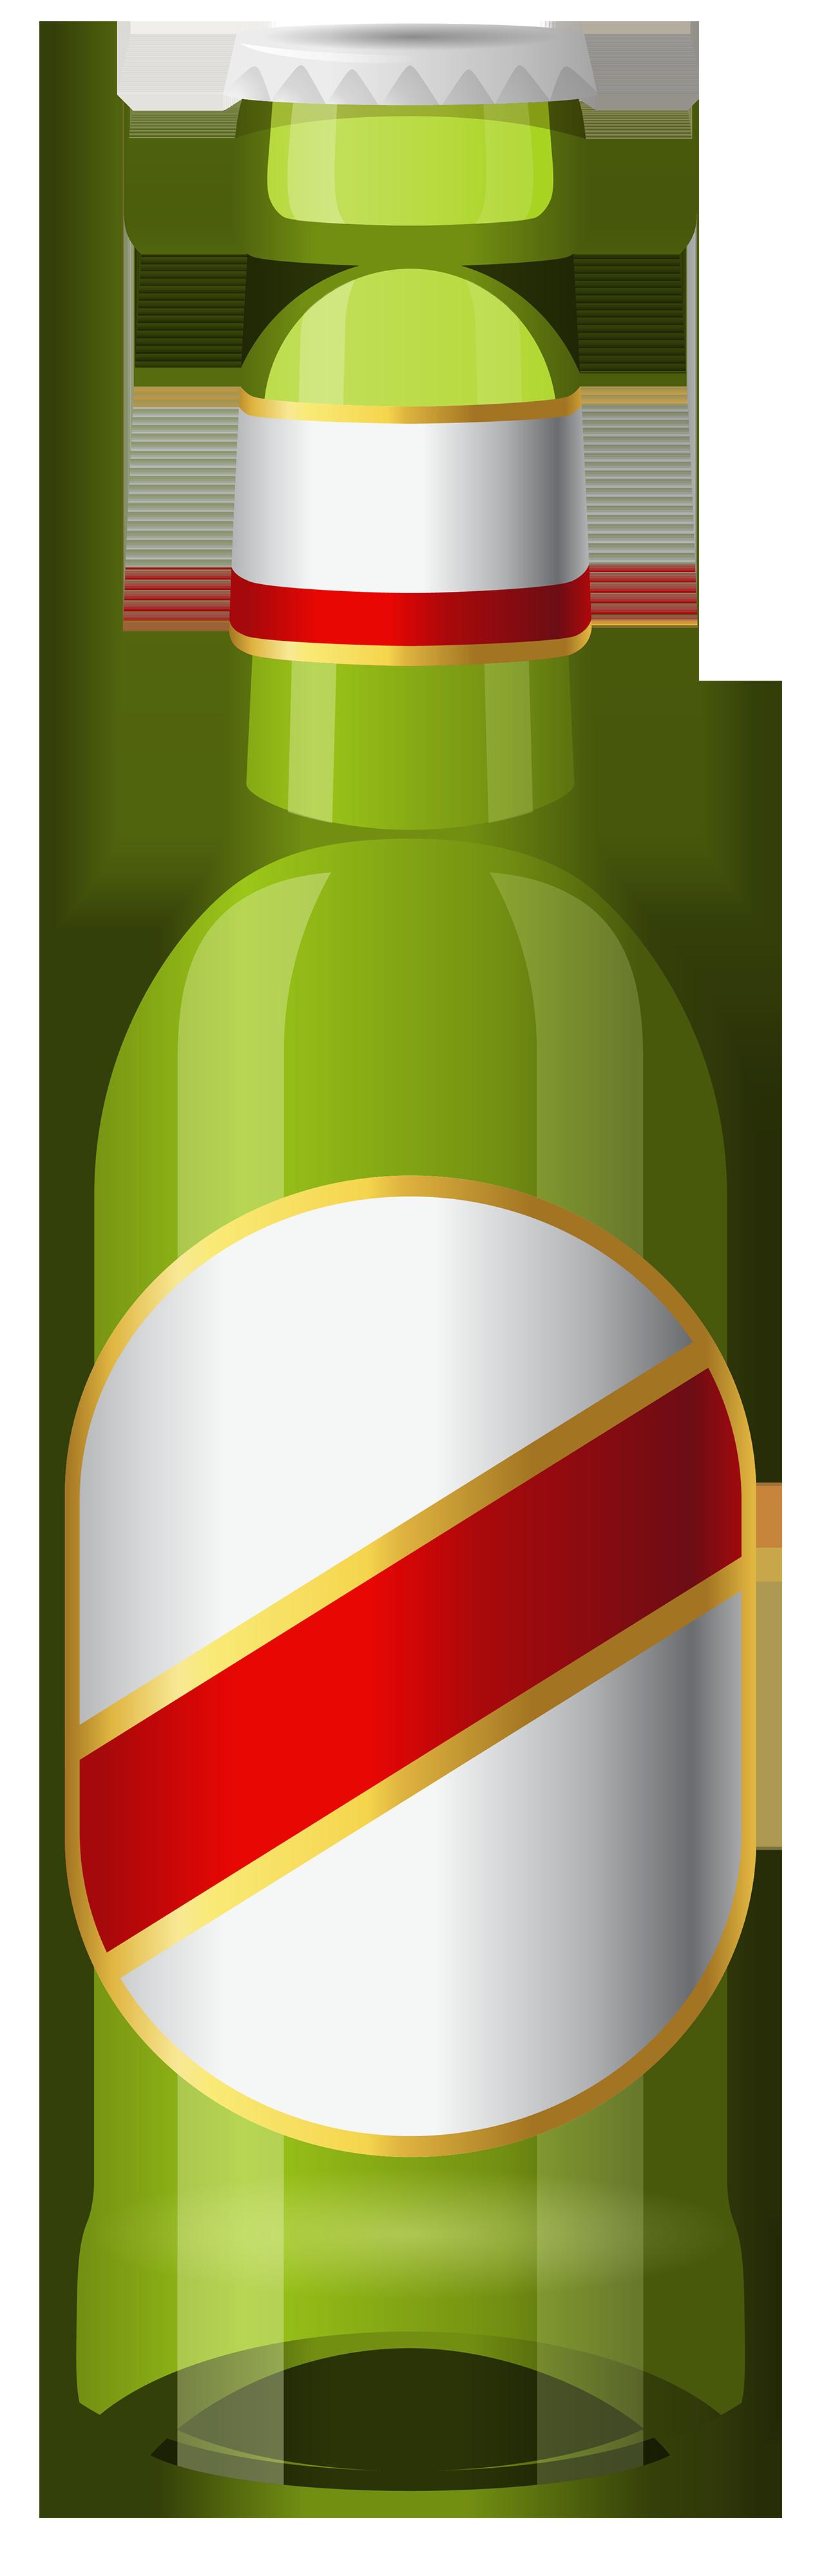 Free Beer Bottle Clip Art, Download Free Clip Art, Free Clip.